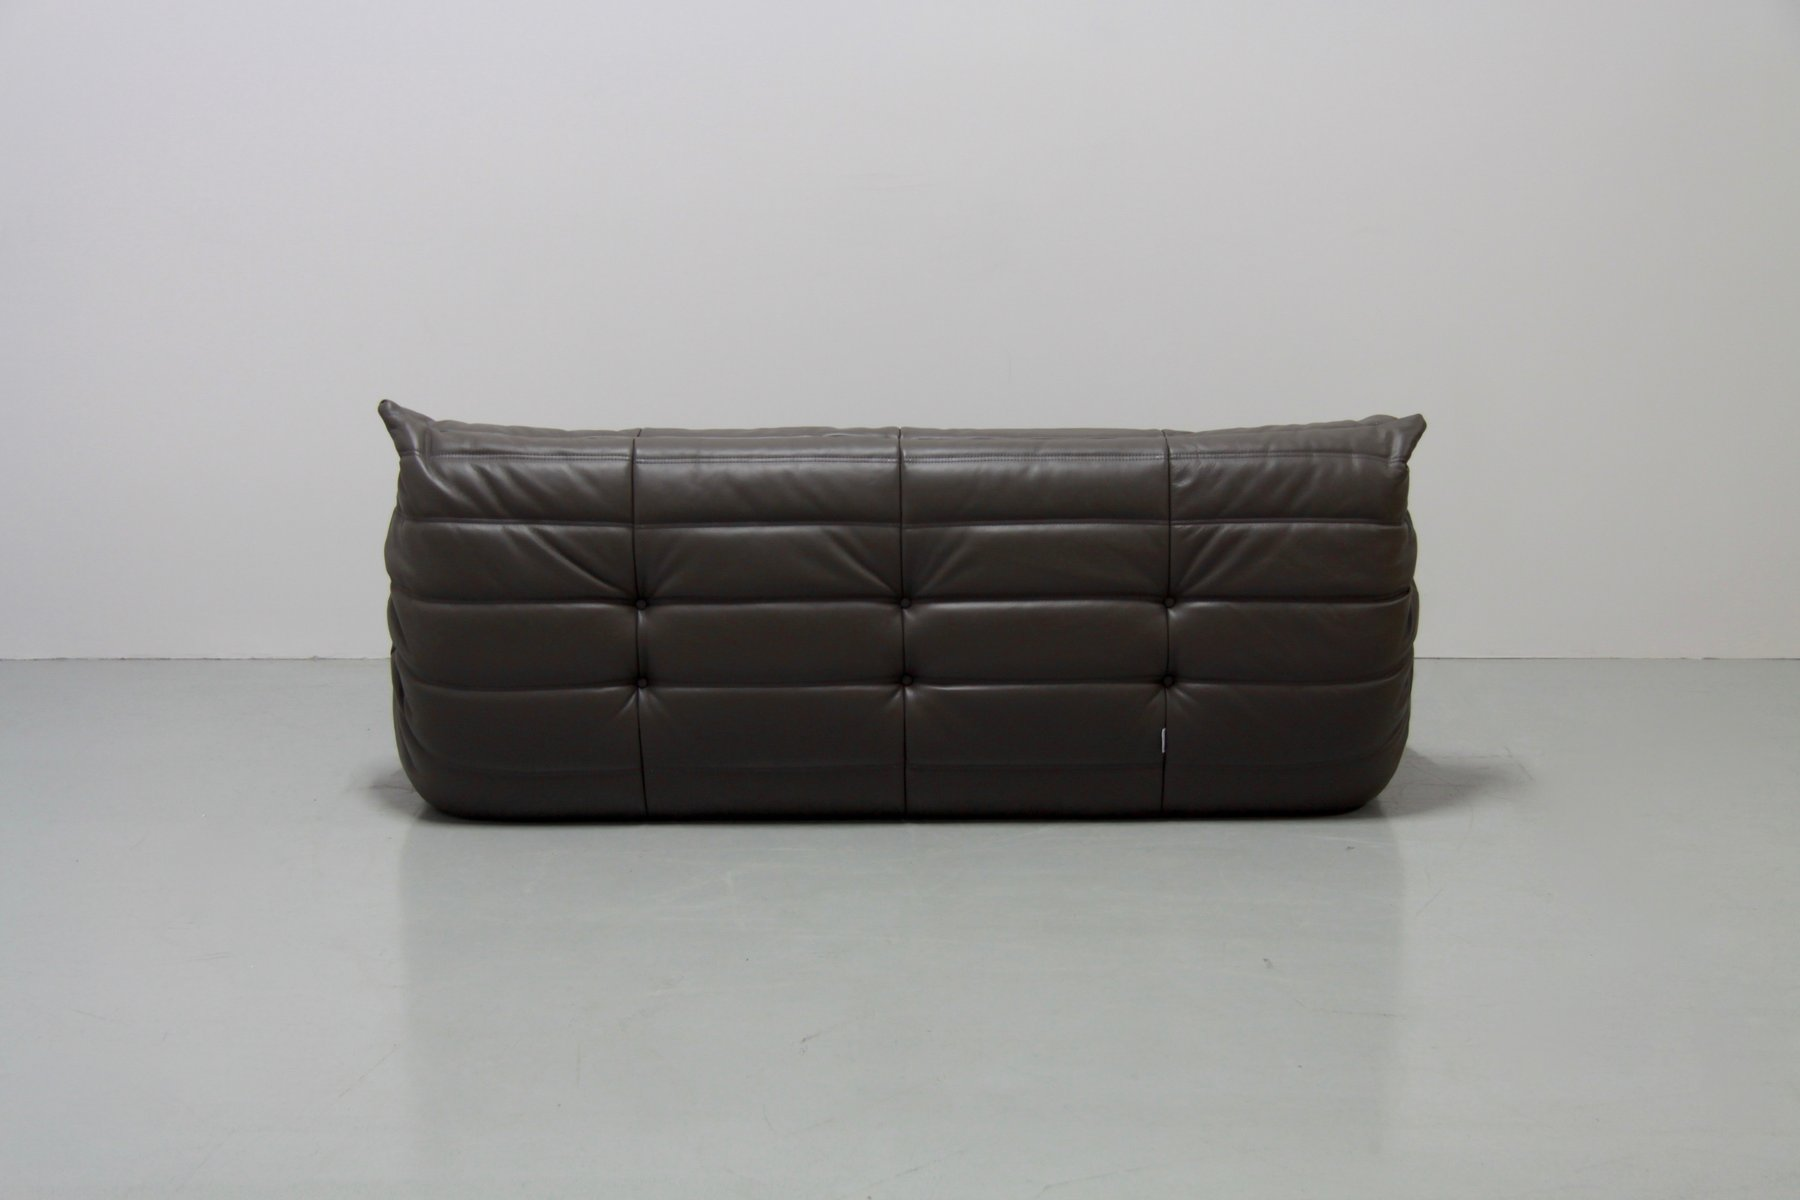 graphite leather togo sofa set by michel ducaroy for ligne roset 1970s for sale at pamono. Black Bedroom Furniture Sets. Home Design Ideas